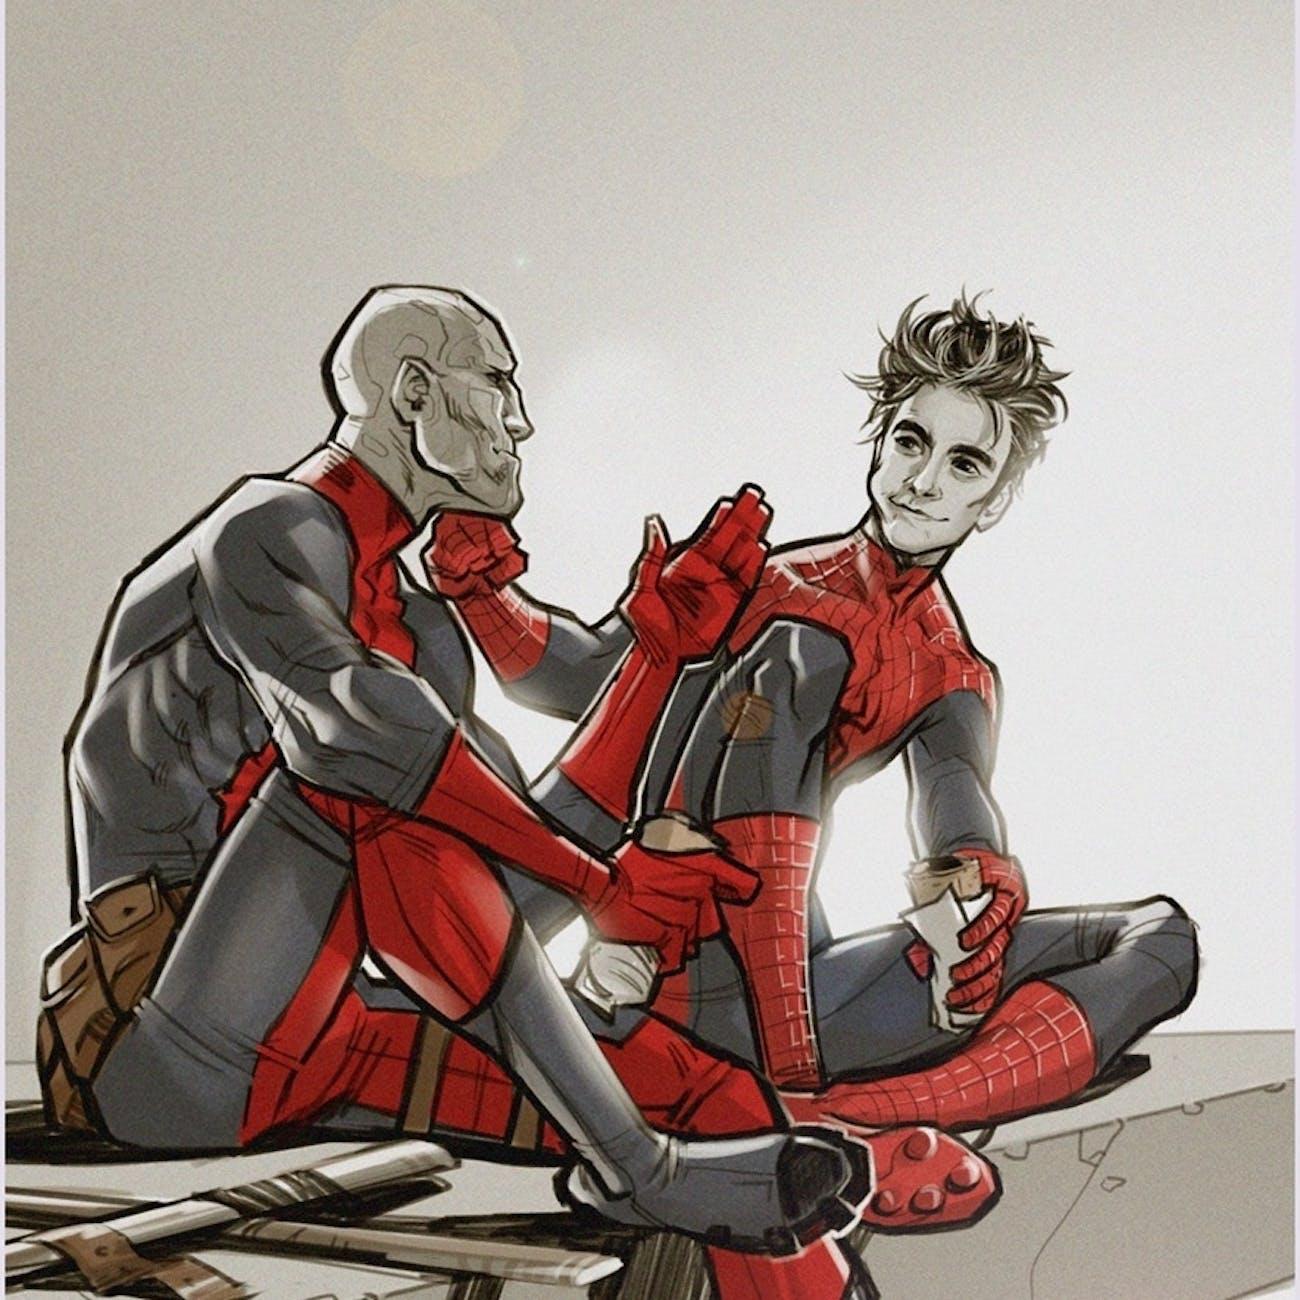 Legions of Marvel Fans Want a Deadpool, Spider-Man Romance